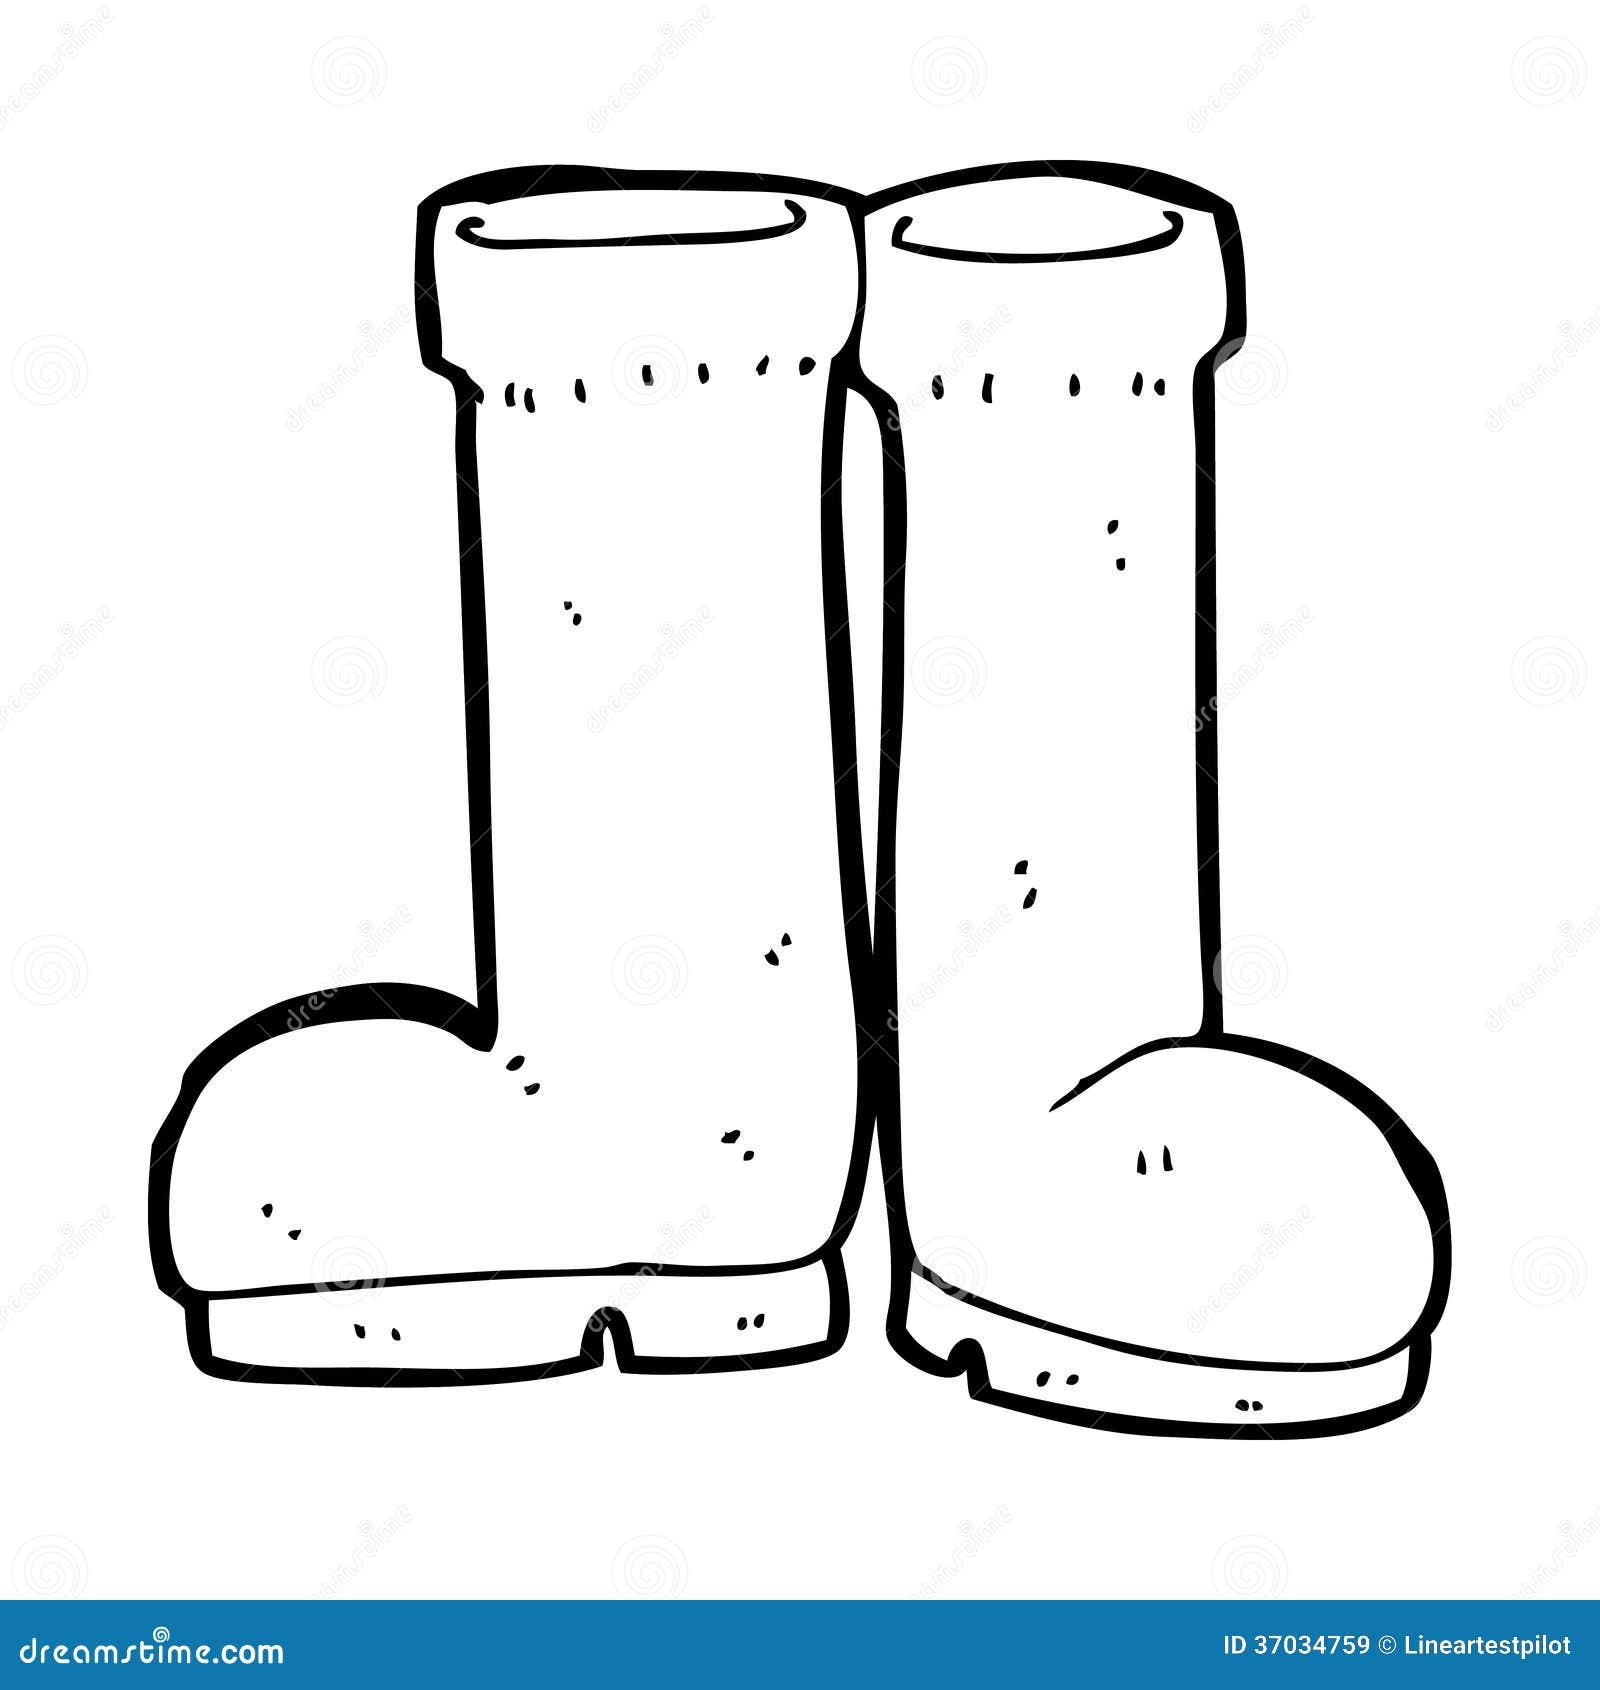 Rain boots coloring page - e-pic.info